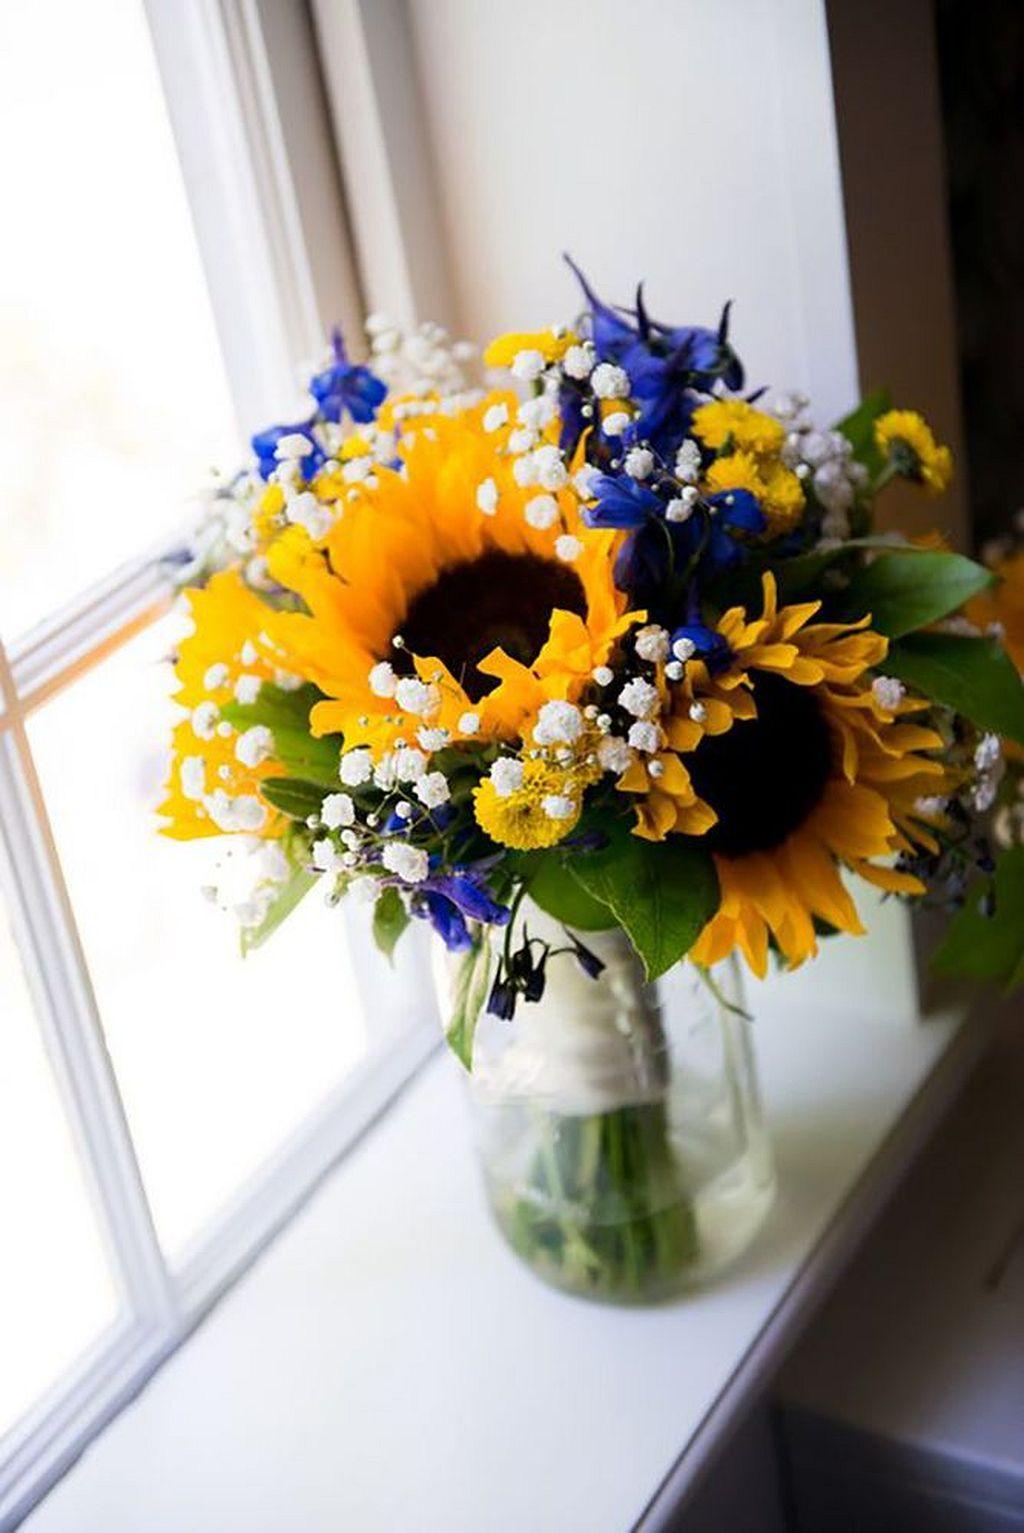 90 ideas sunflower wedding theme sunflower wedding themes stunning 90 ideas sunflower wedding theme httpsweddmagz90 junglespirit Choice Image